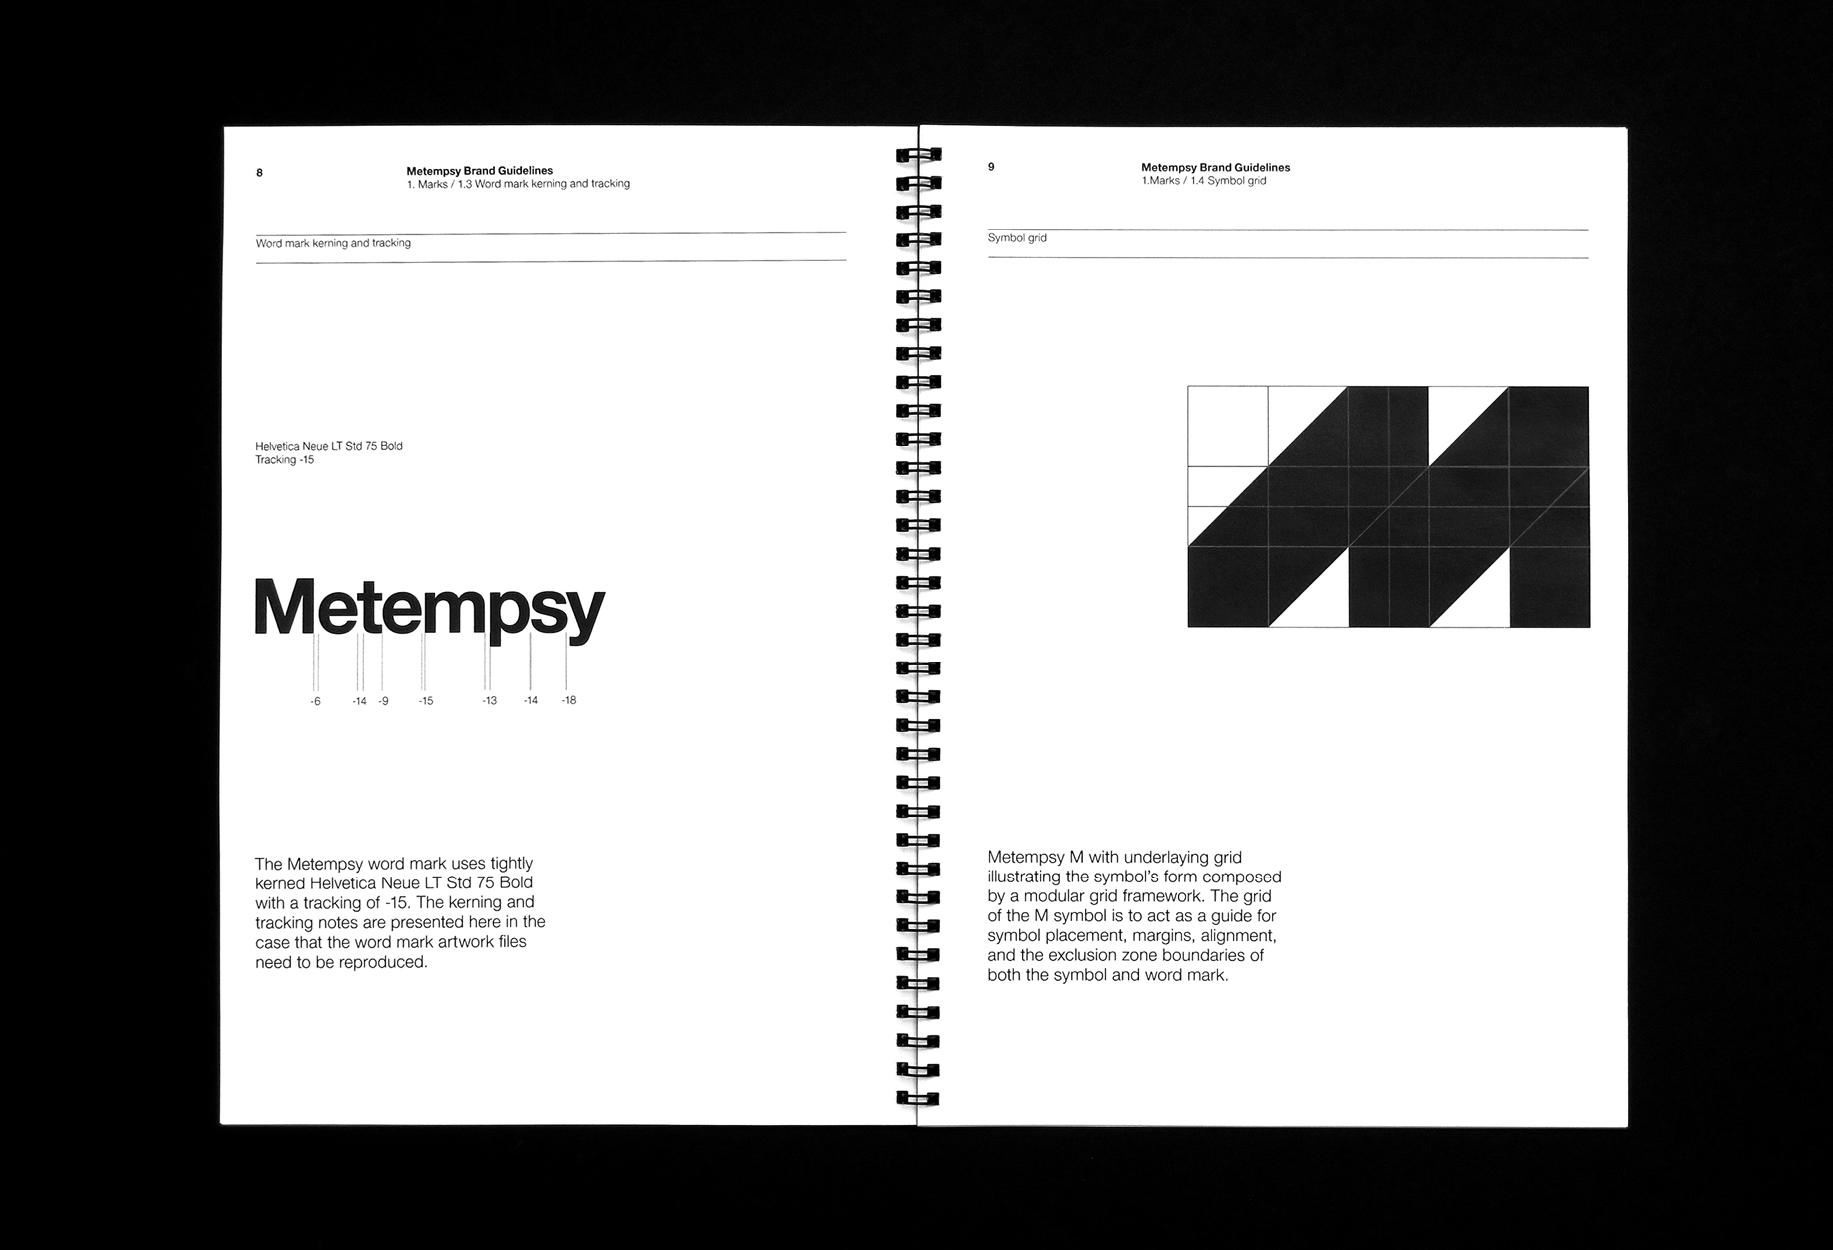 Metempsy-Graphic-Design-Standards-Manual-5.jpg